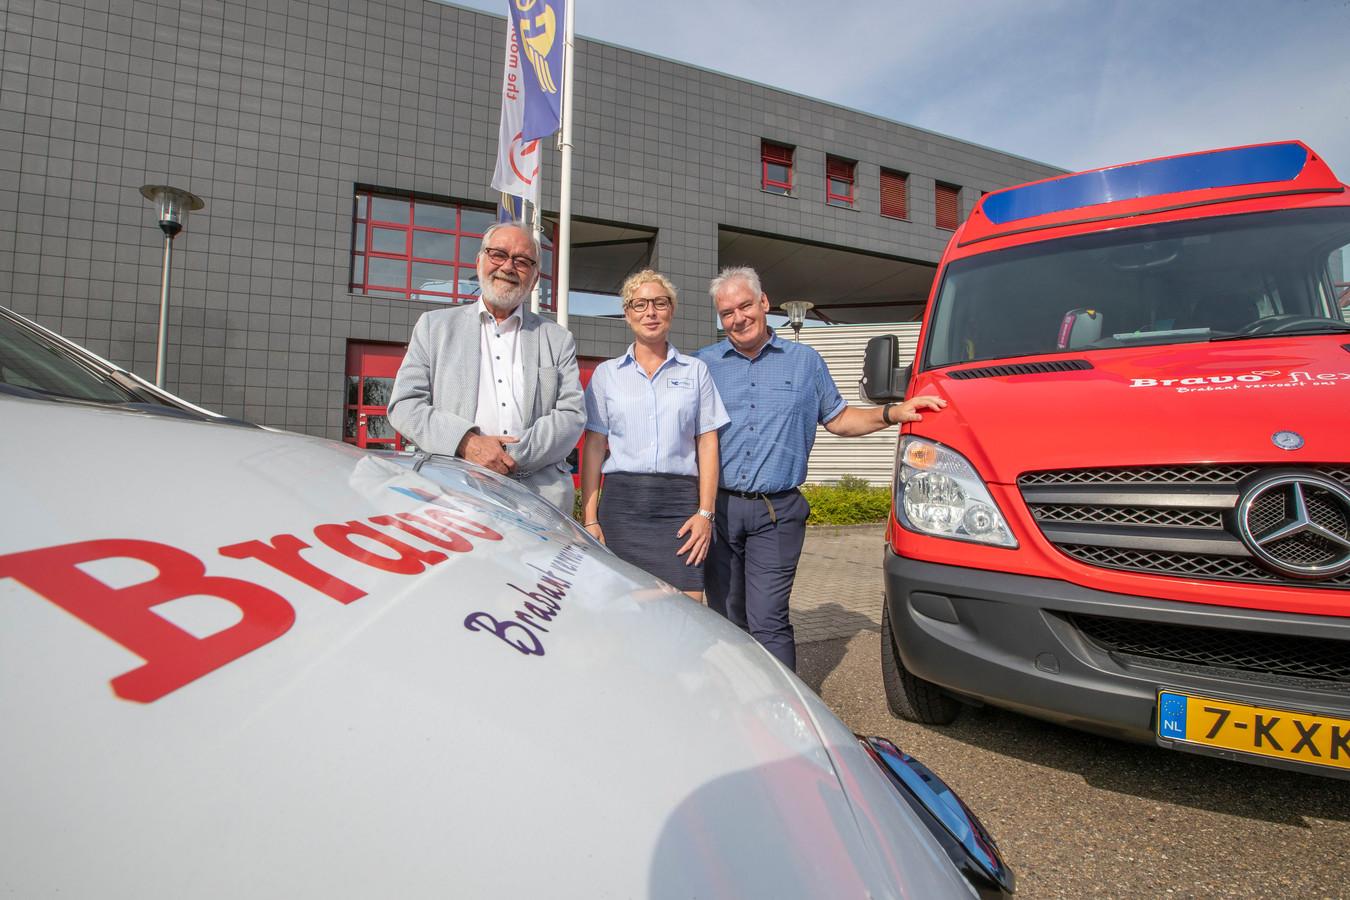 V.l.n.r: Hermes-woordvoerder Hans Spek, chauffeur Lea Schapendonk en rayonmanager Theo Duivesteijn.